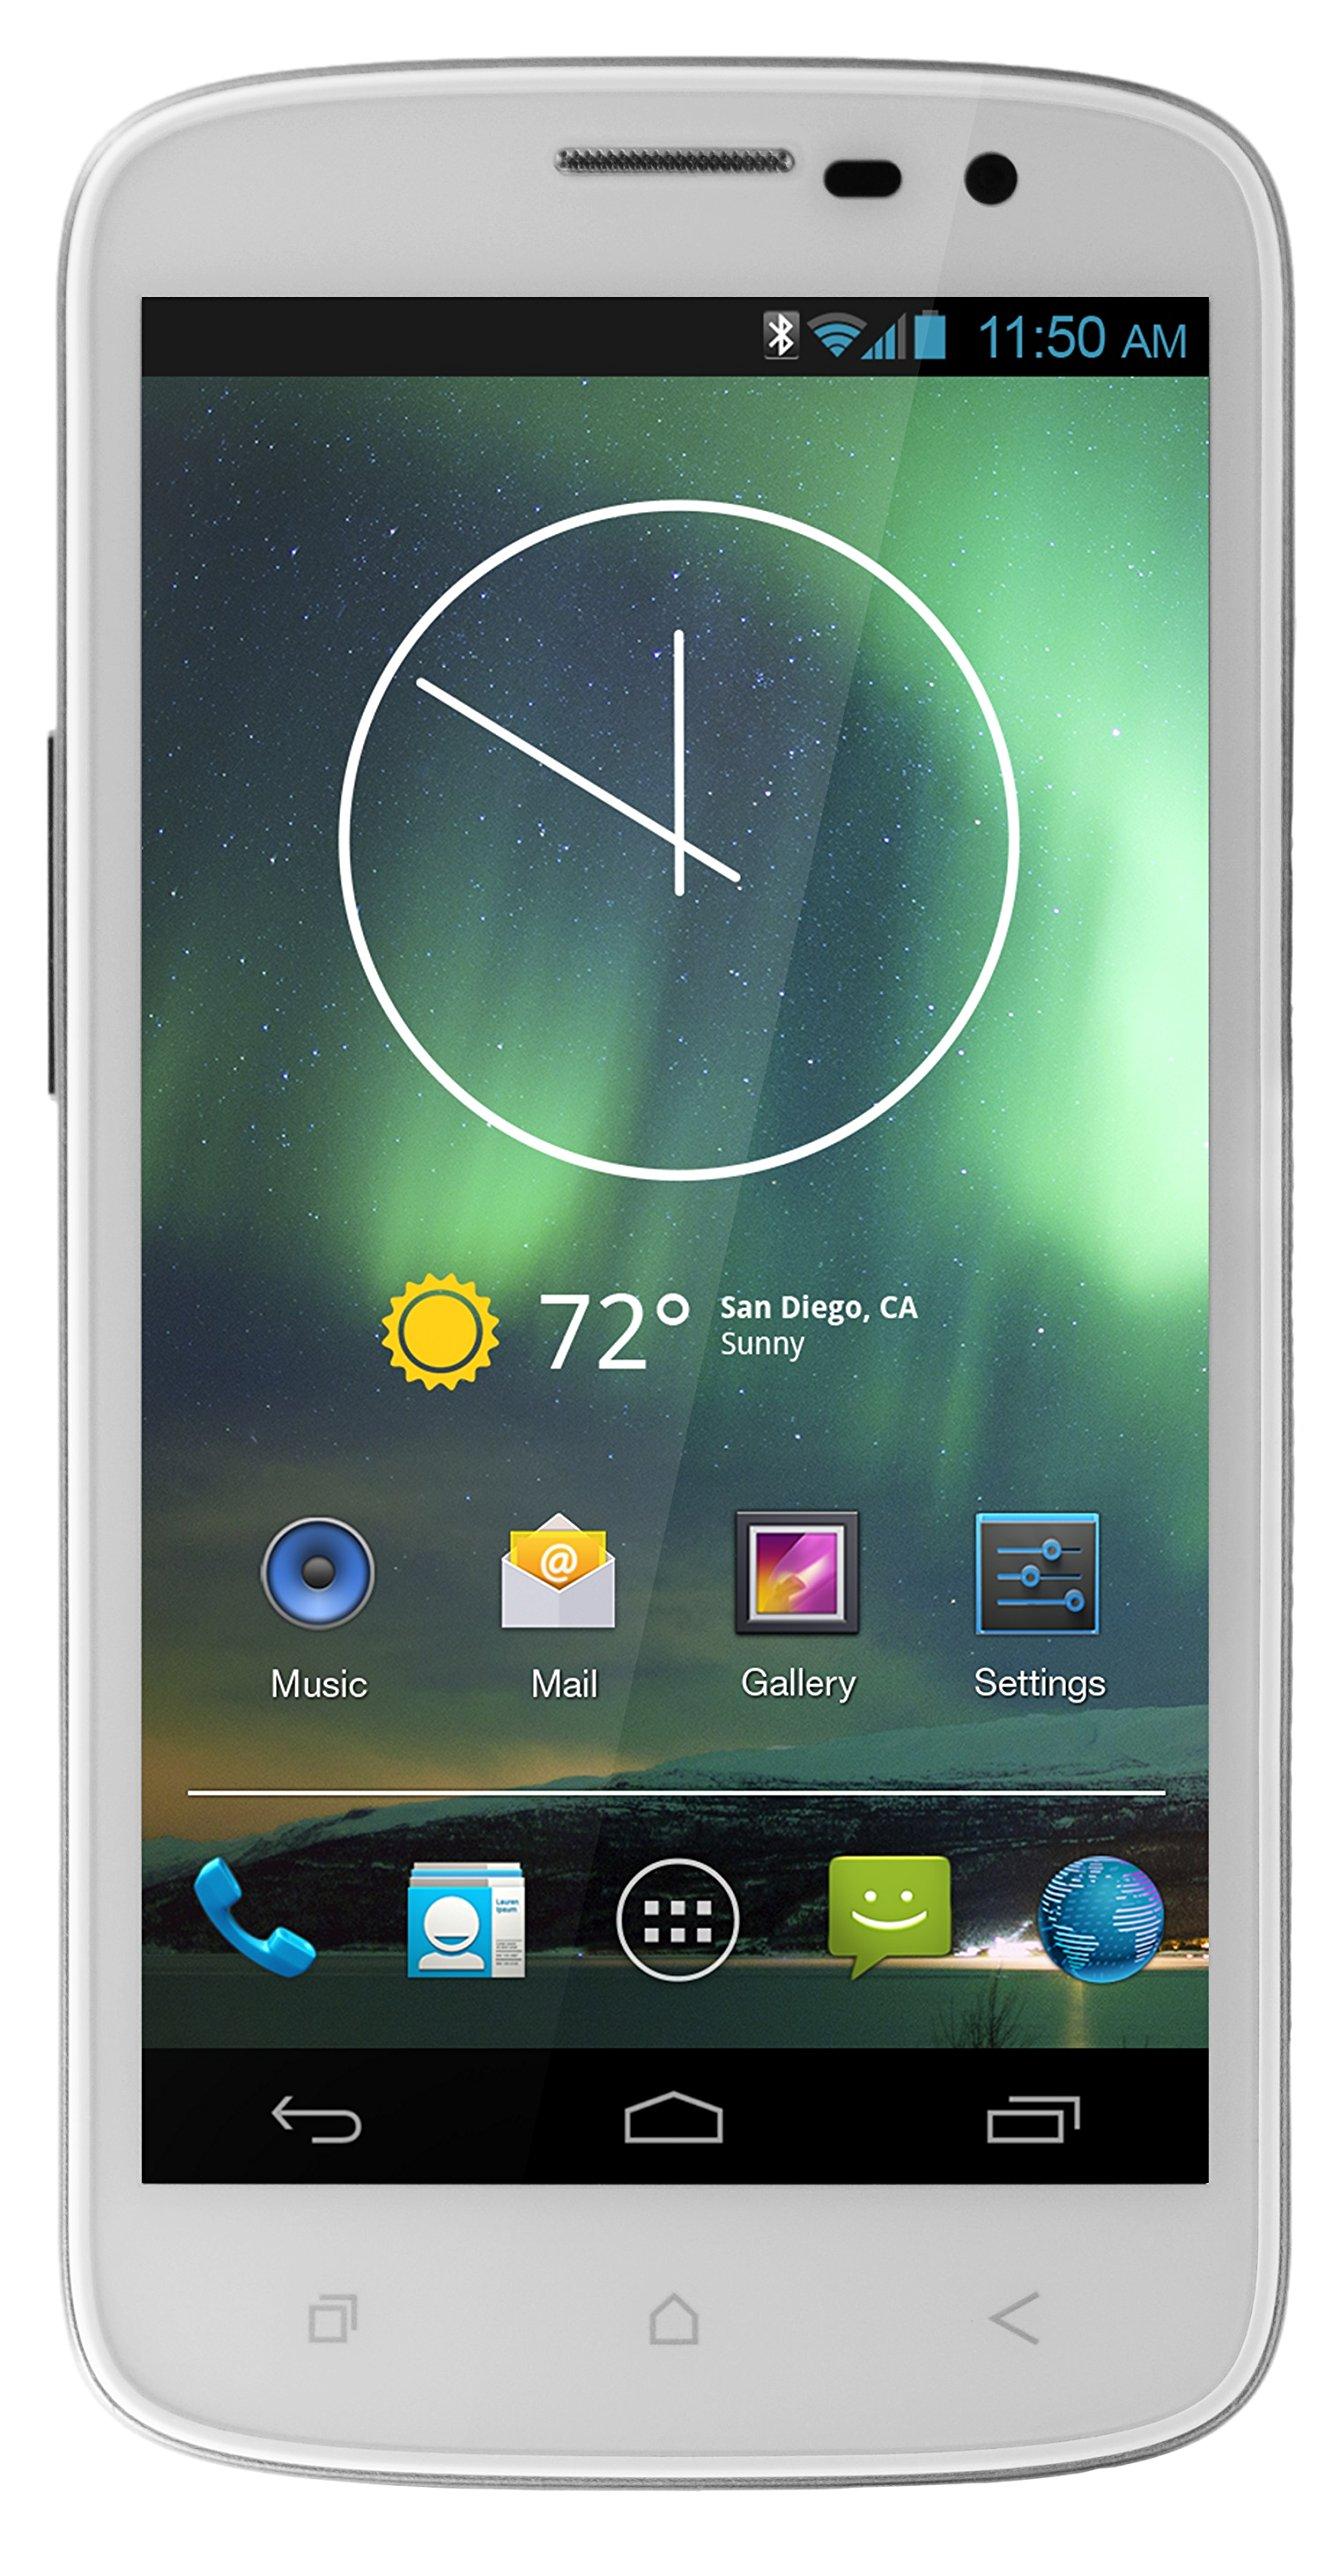 verykool  SL5000 (White) - Unlocked Cell Phones - Retail Packaging - White